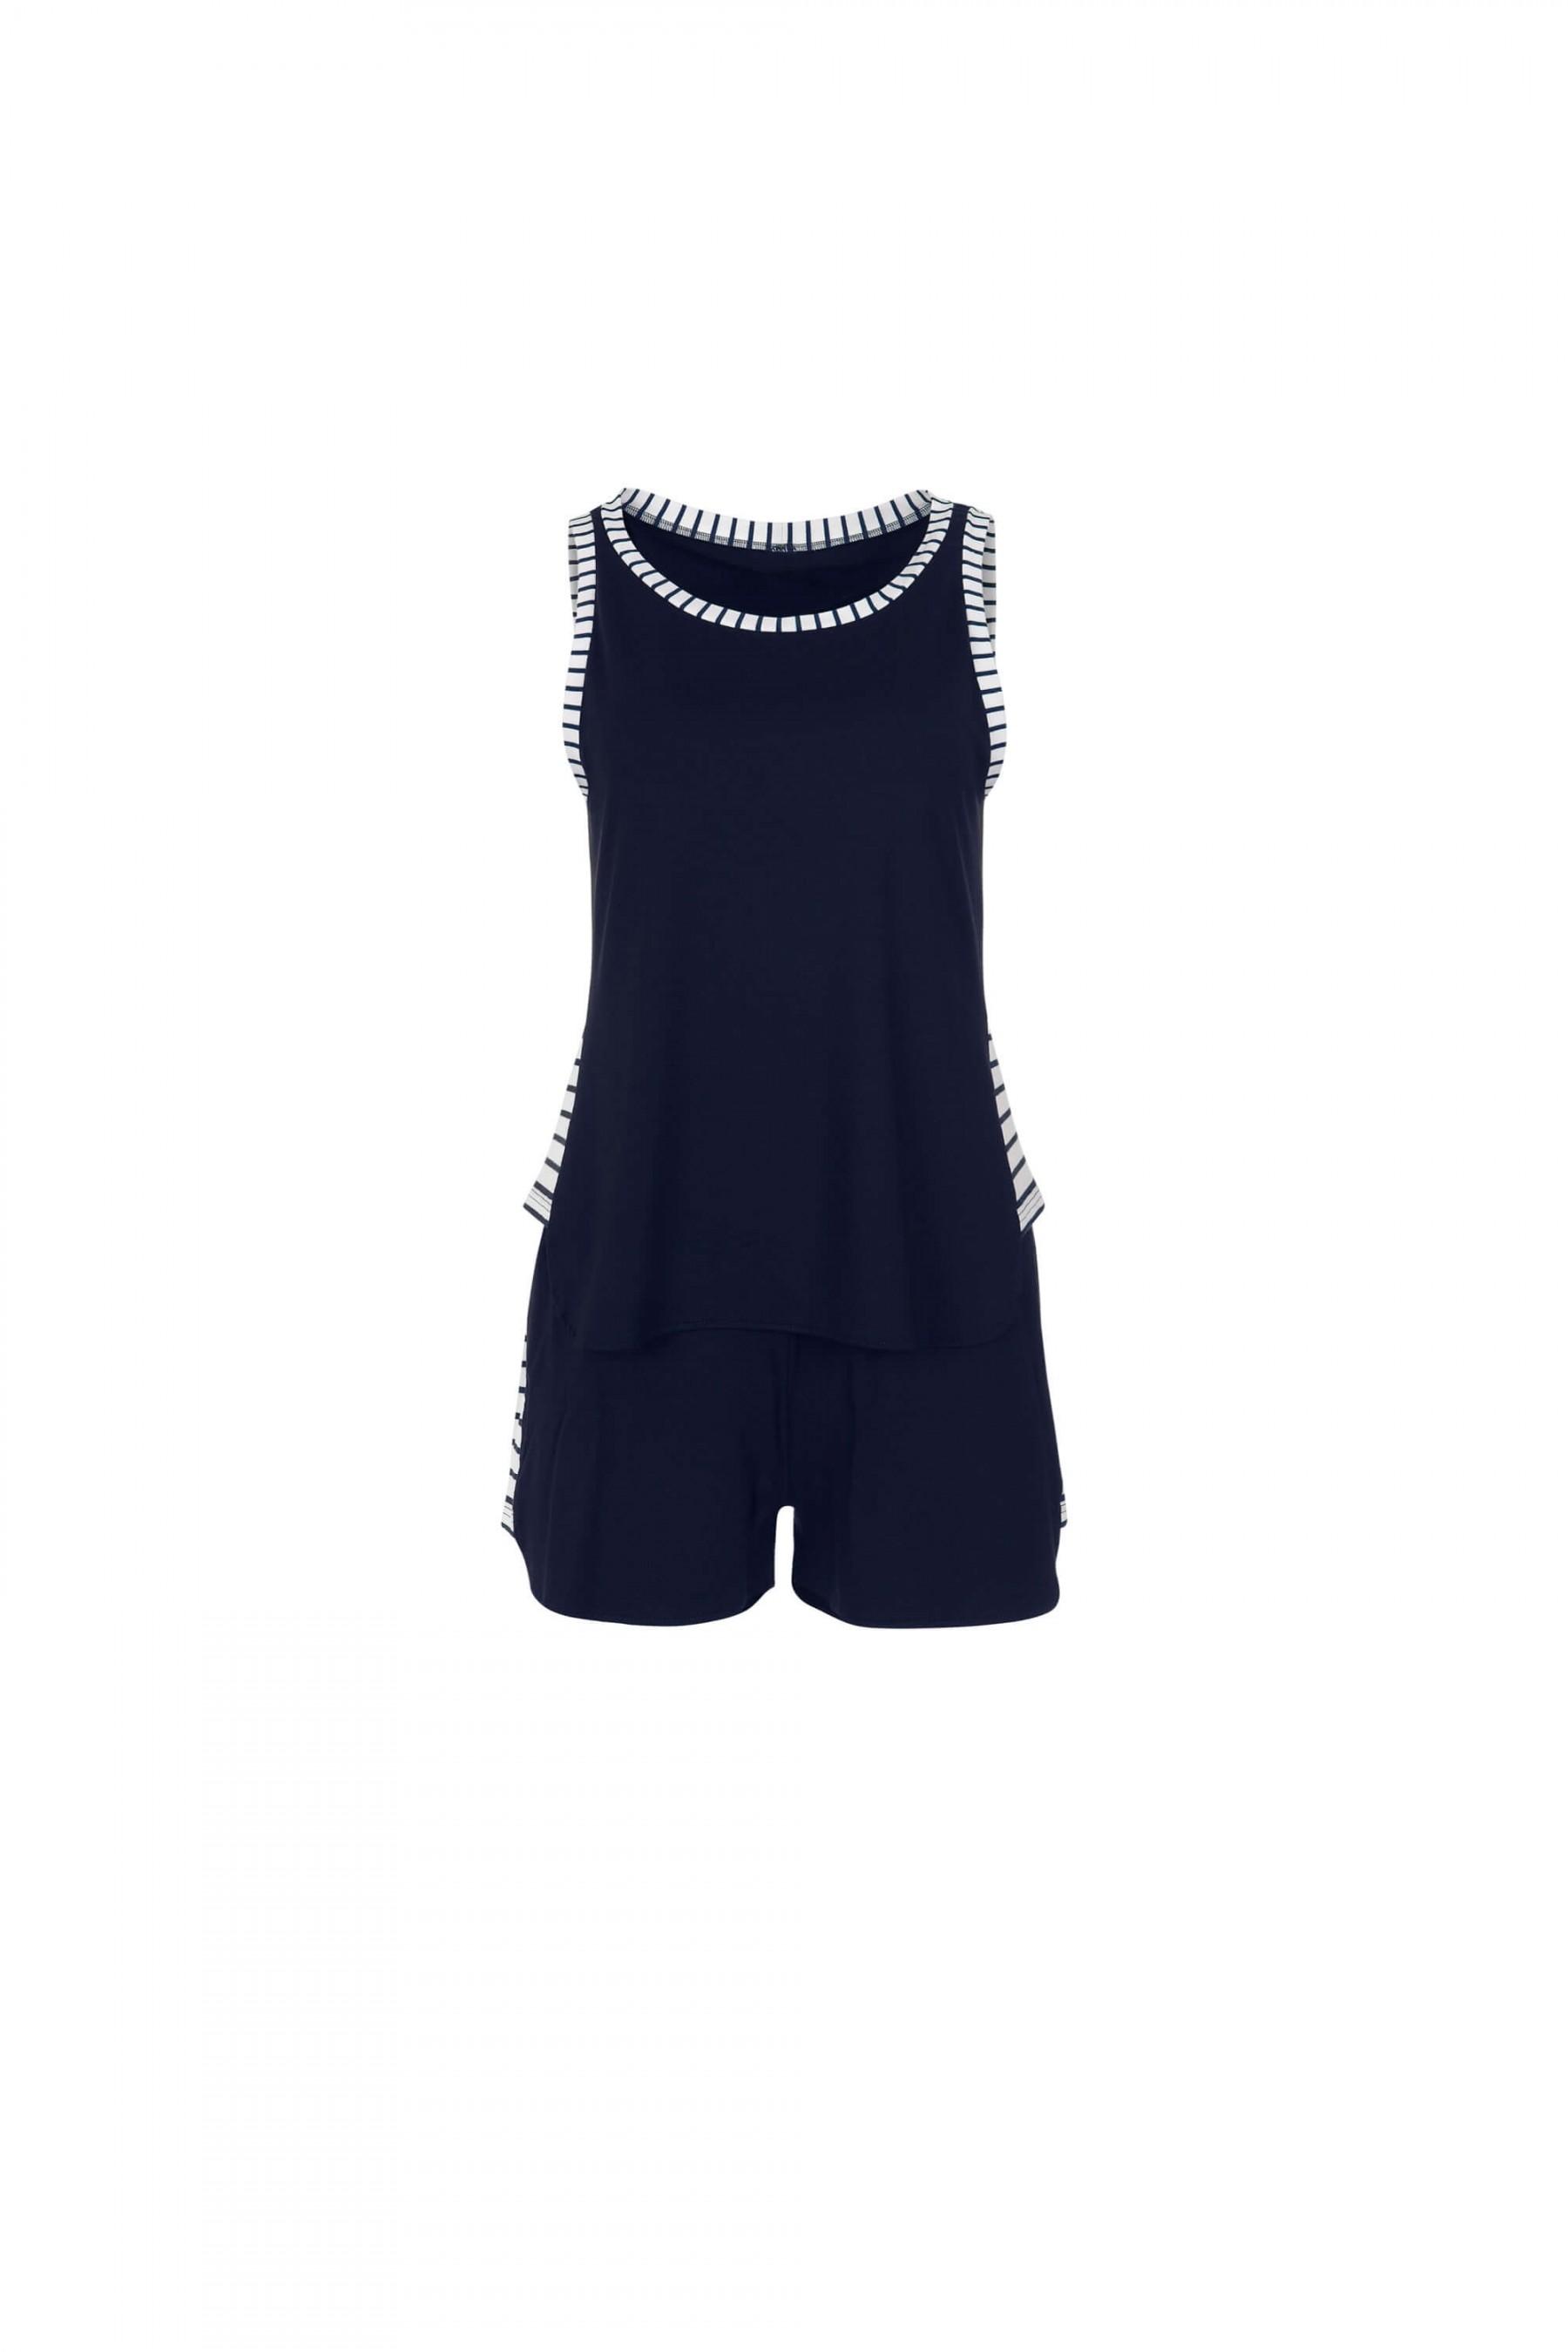 23269 - »Francis« Pyjama with Sweatshirt and Shorts